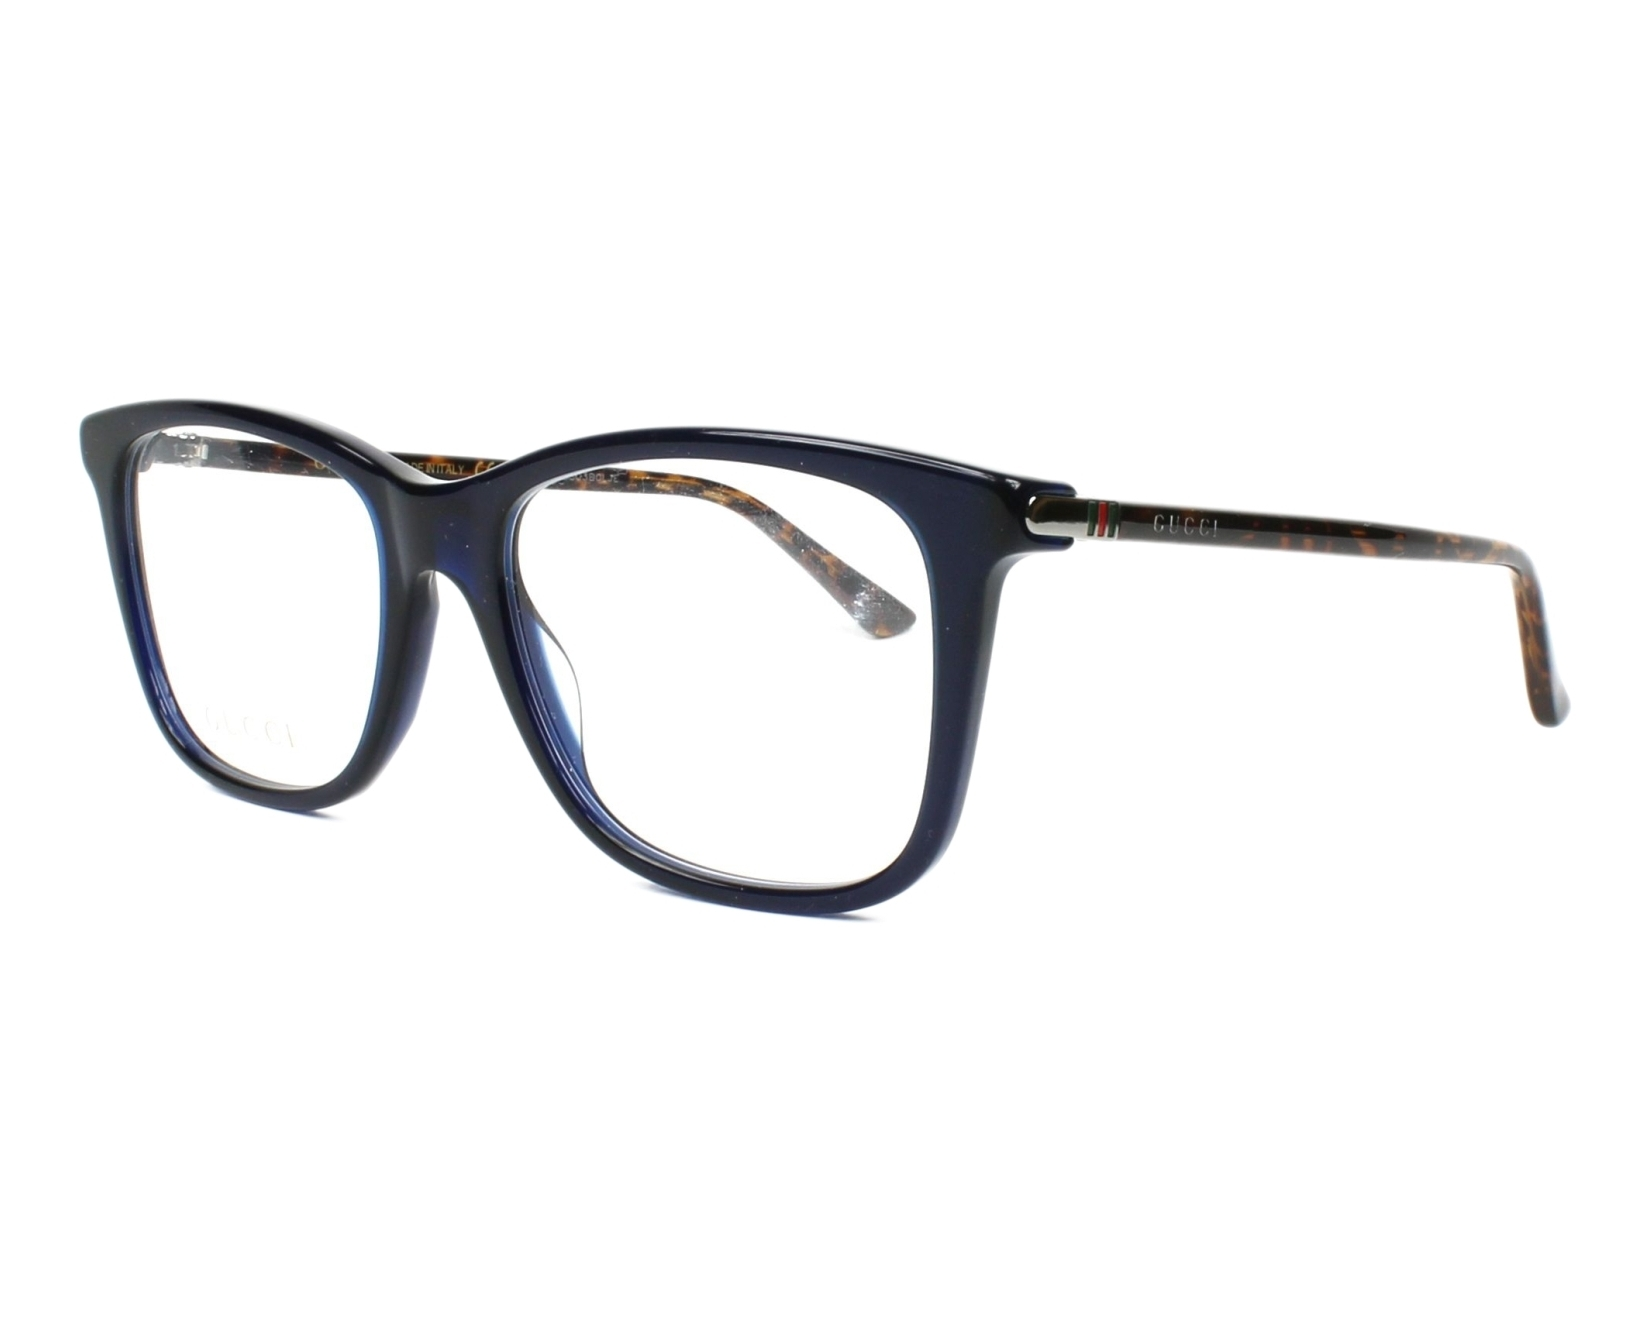 Gucci Eyeglasses Blue GG-00180 007 - Visionet US